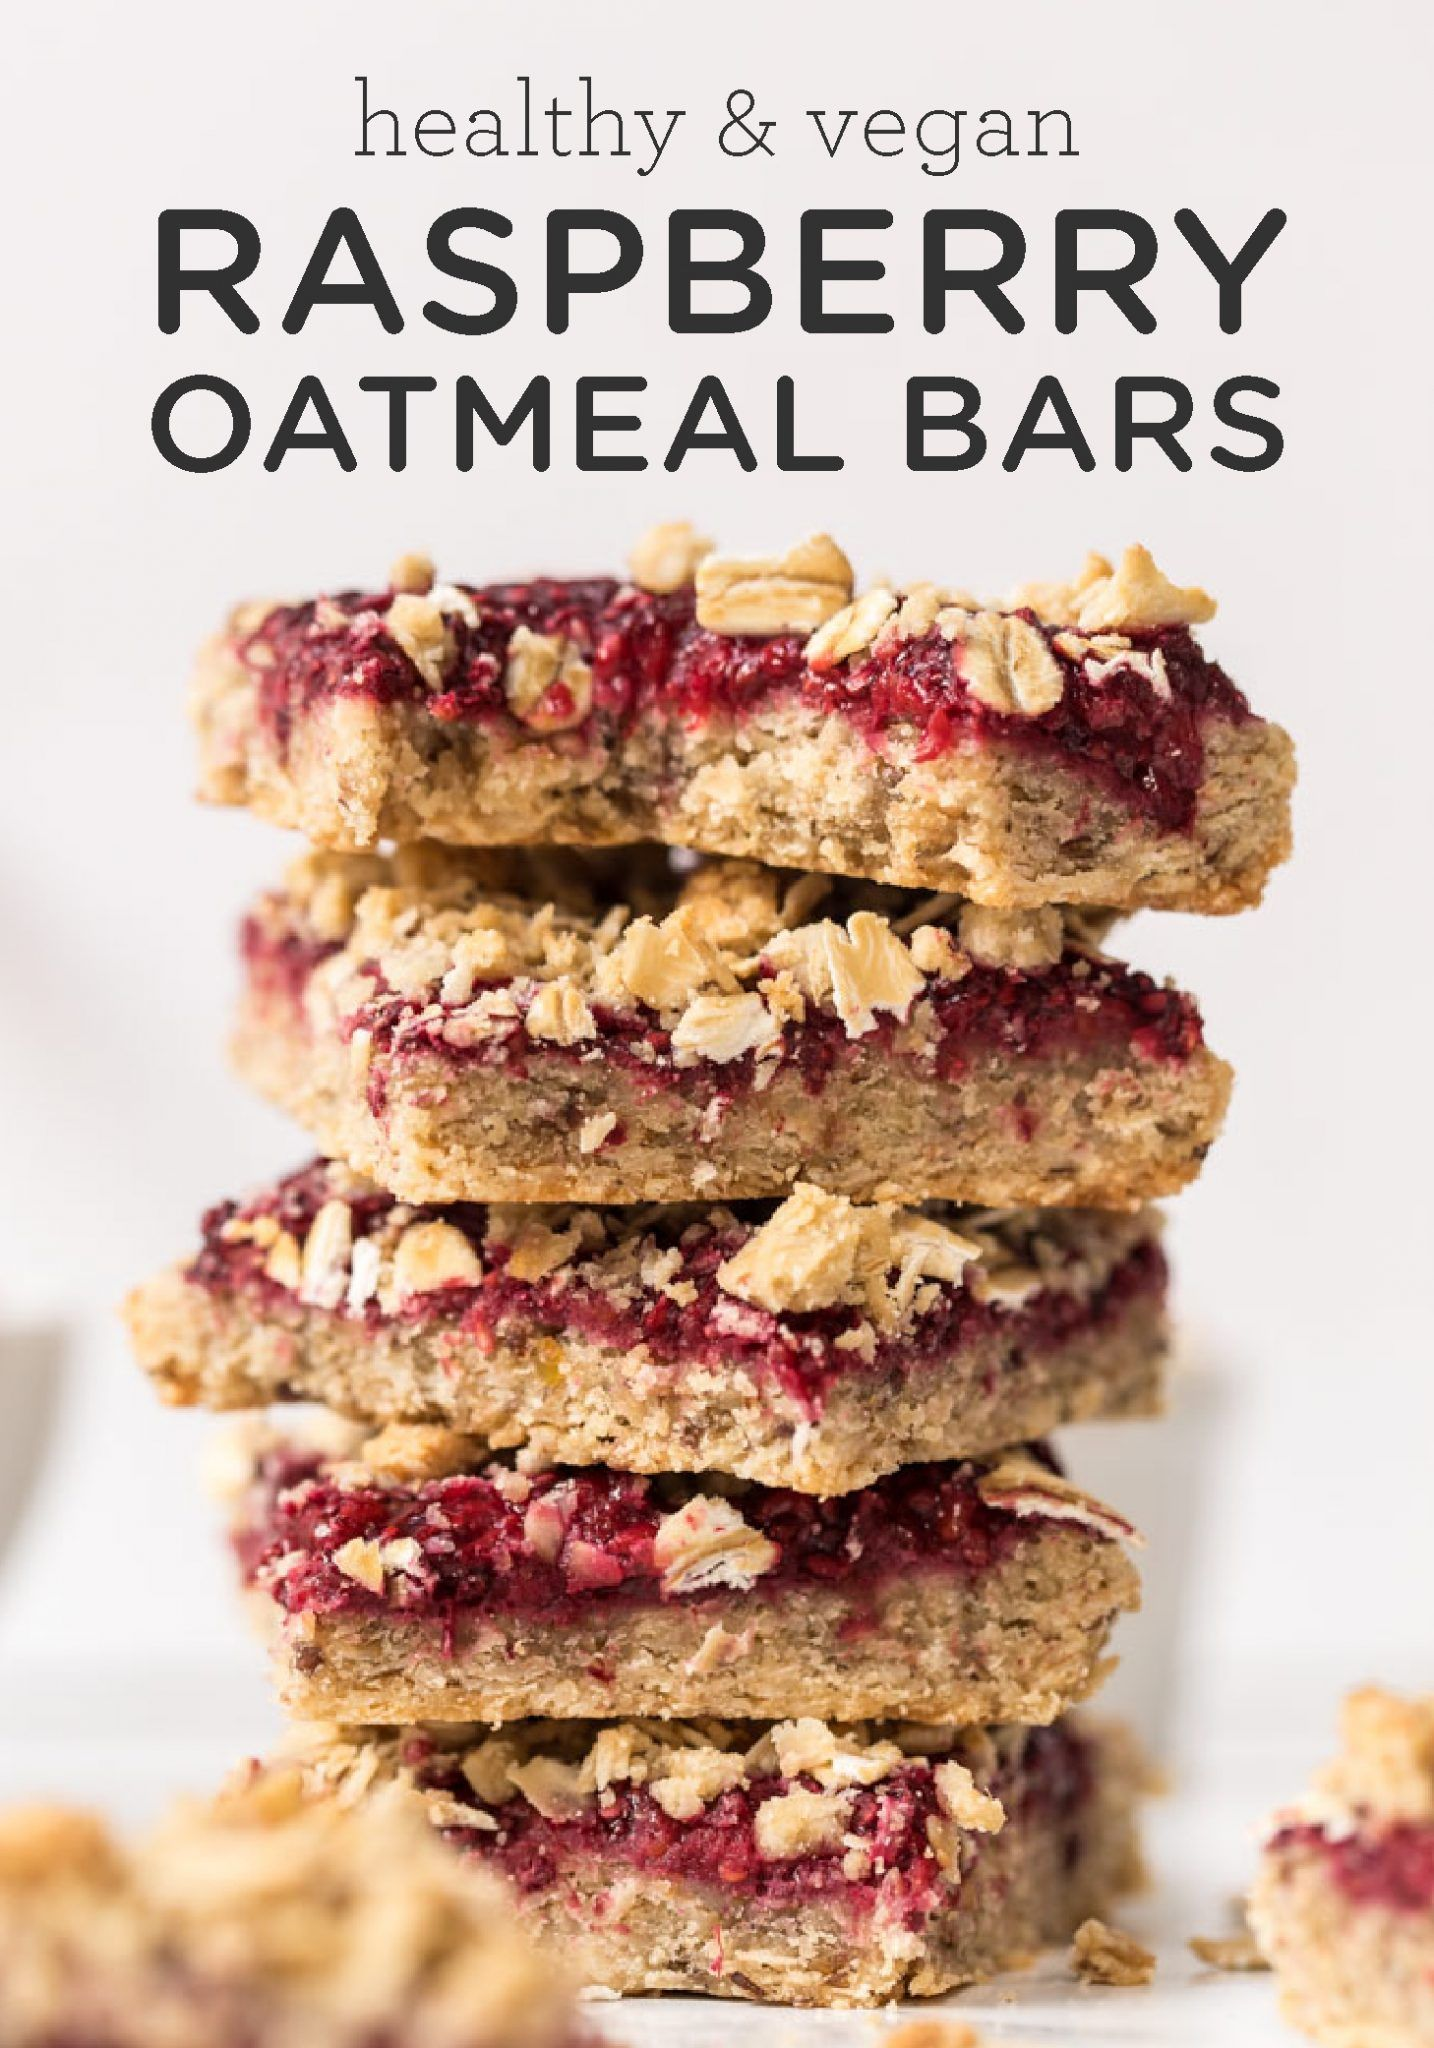 Healthy Vegan Raspberry Oatmeal Bars Simply Quinoa Recipe Oatmeal Bars Recipes Raspberry Oatmeal Bars Recipes